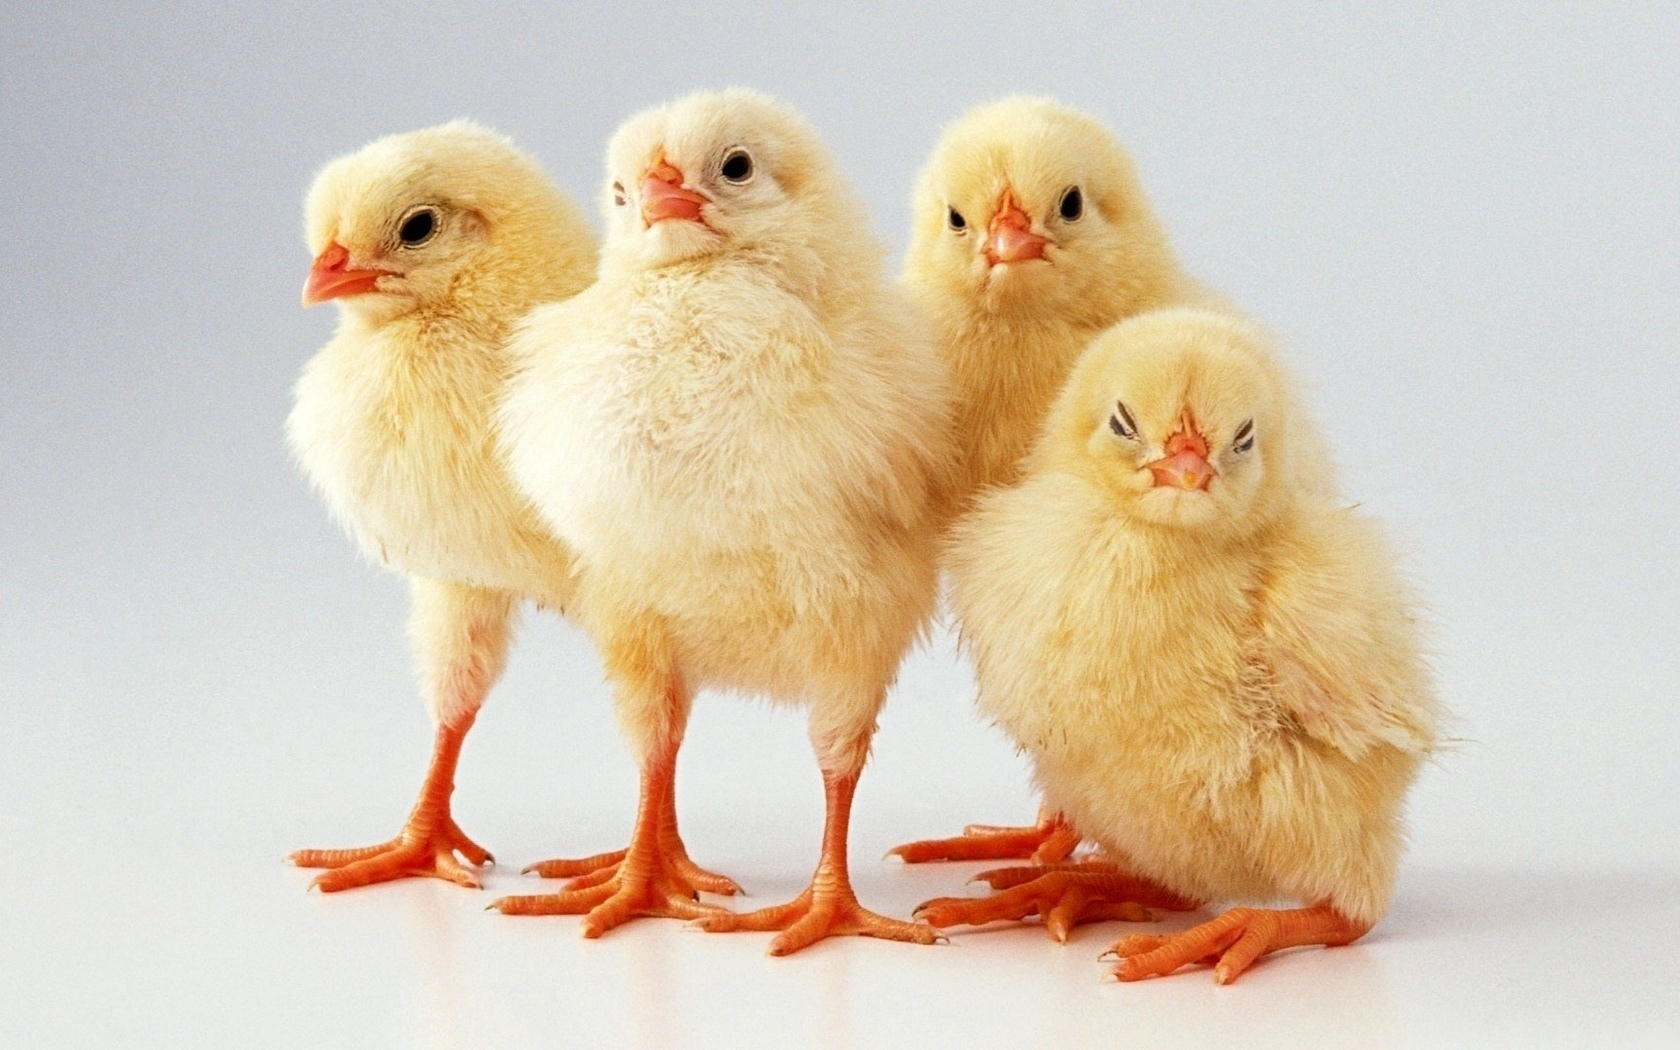 Сонник птенцы курицы